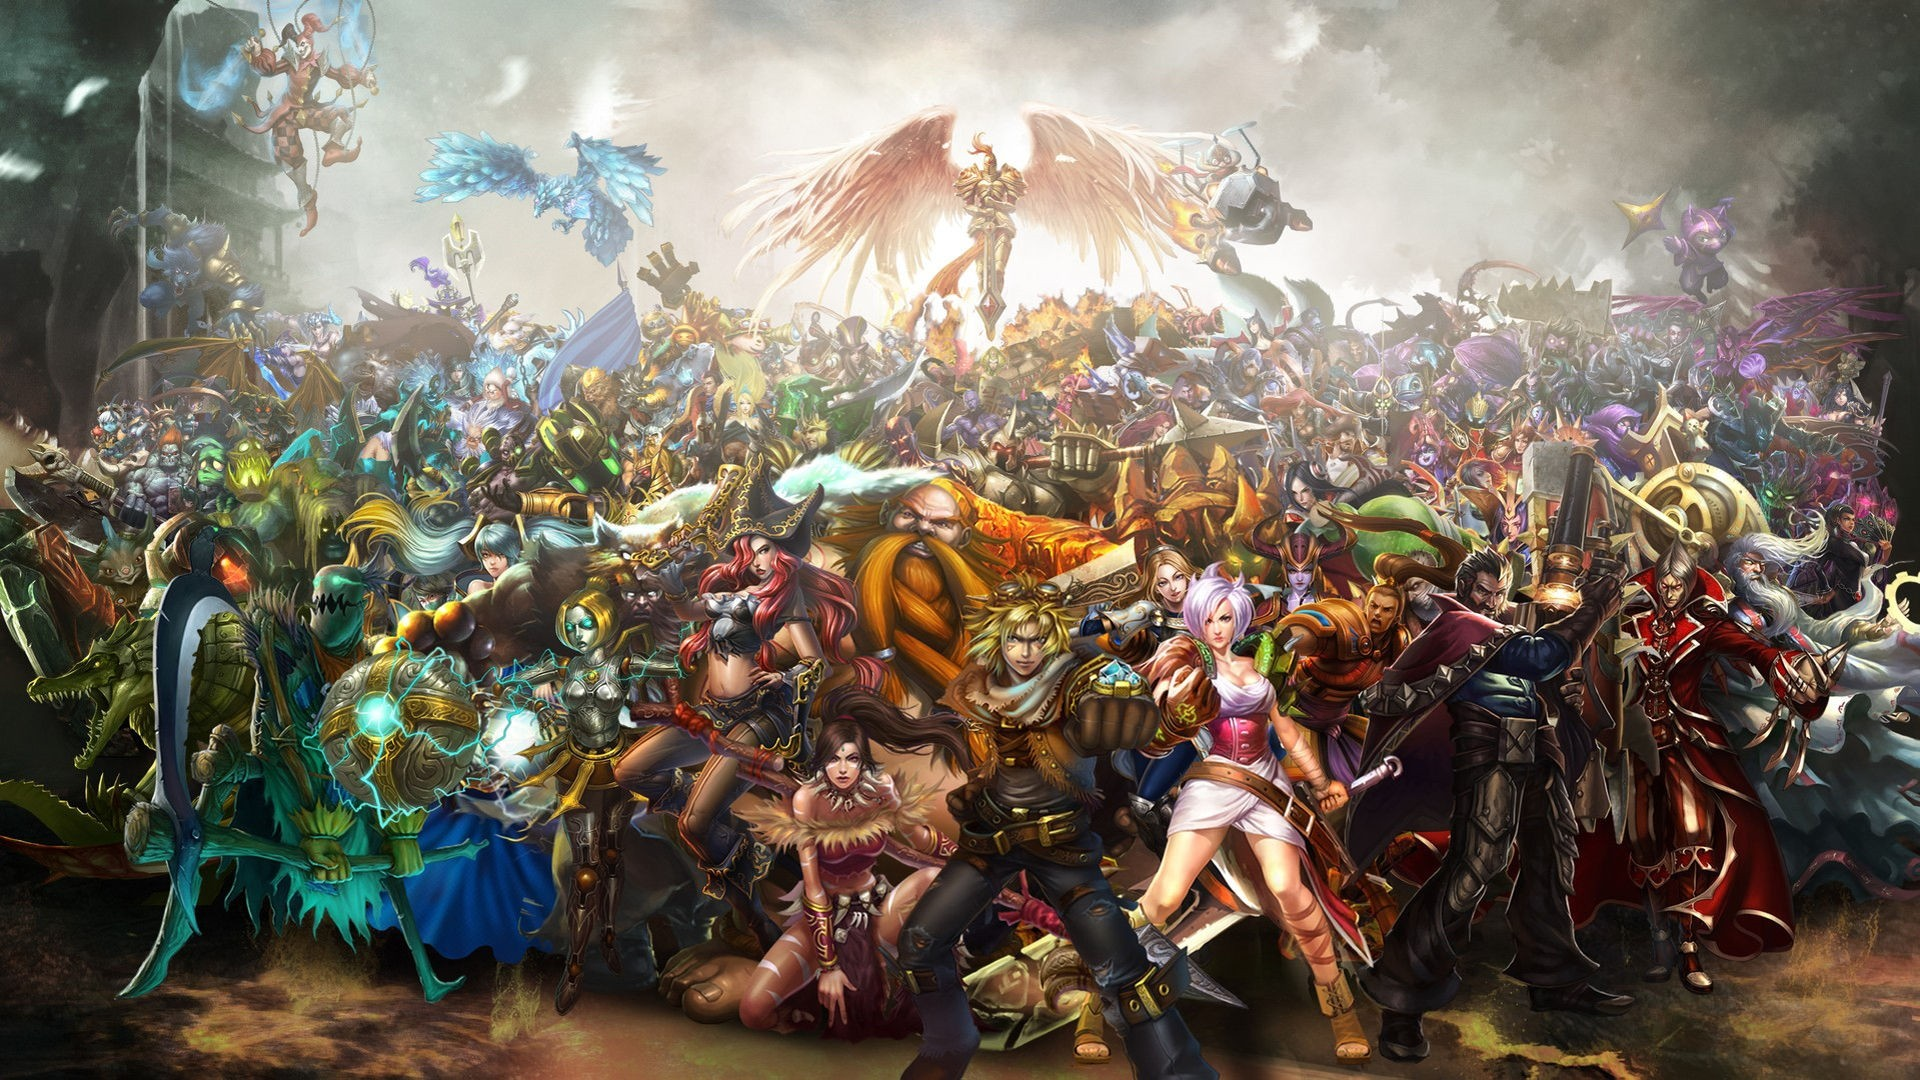 League Of Legends hd wallpaper for laptop